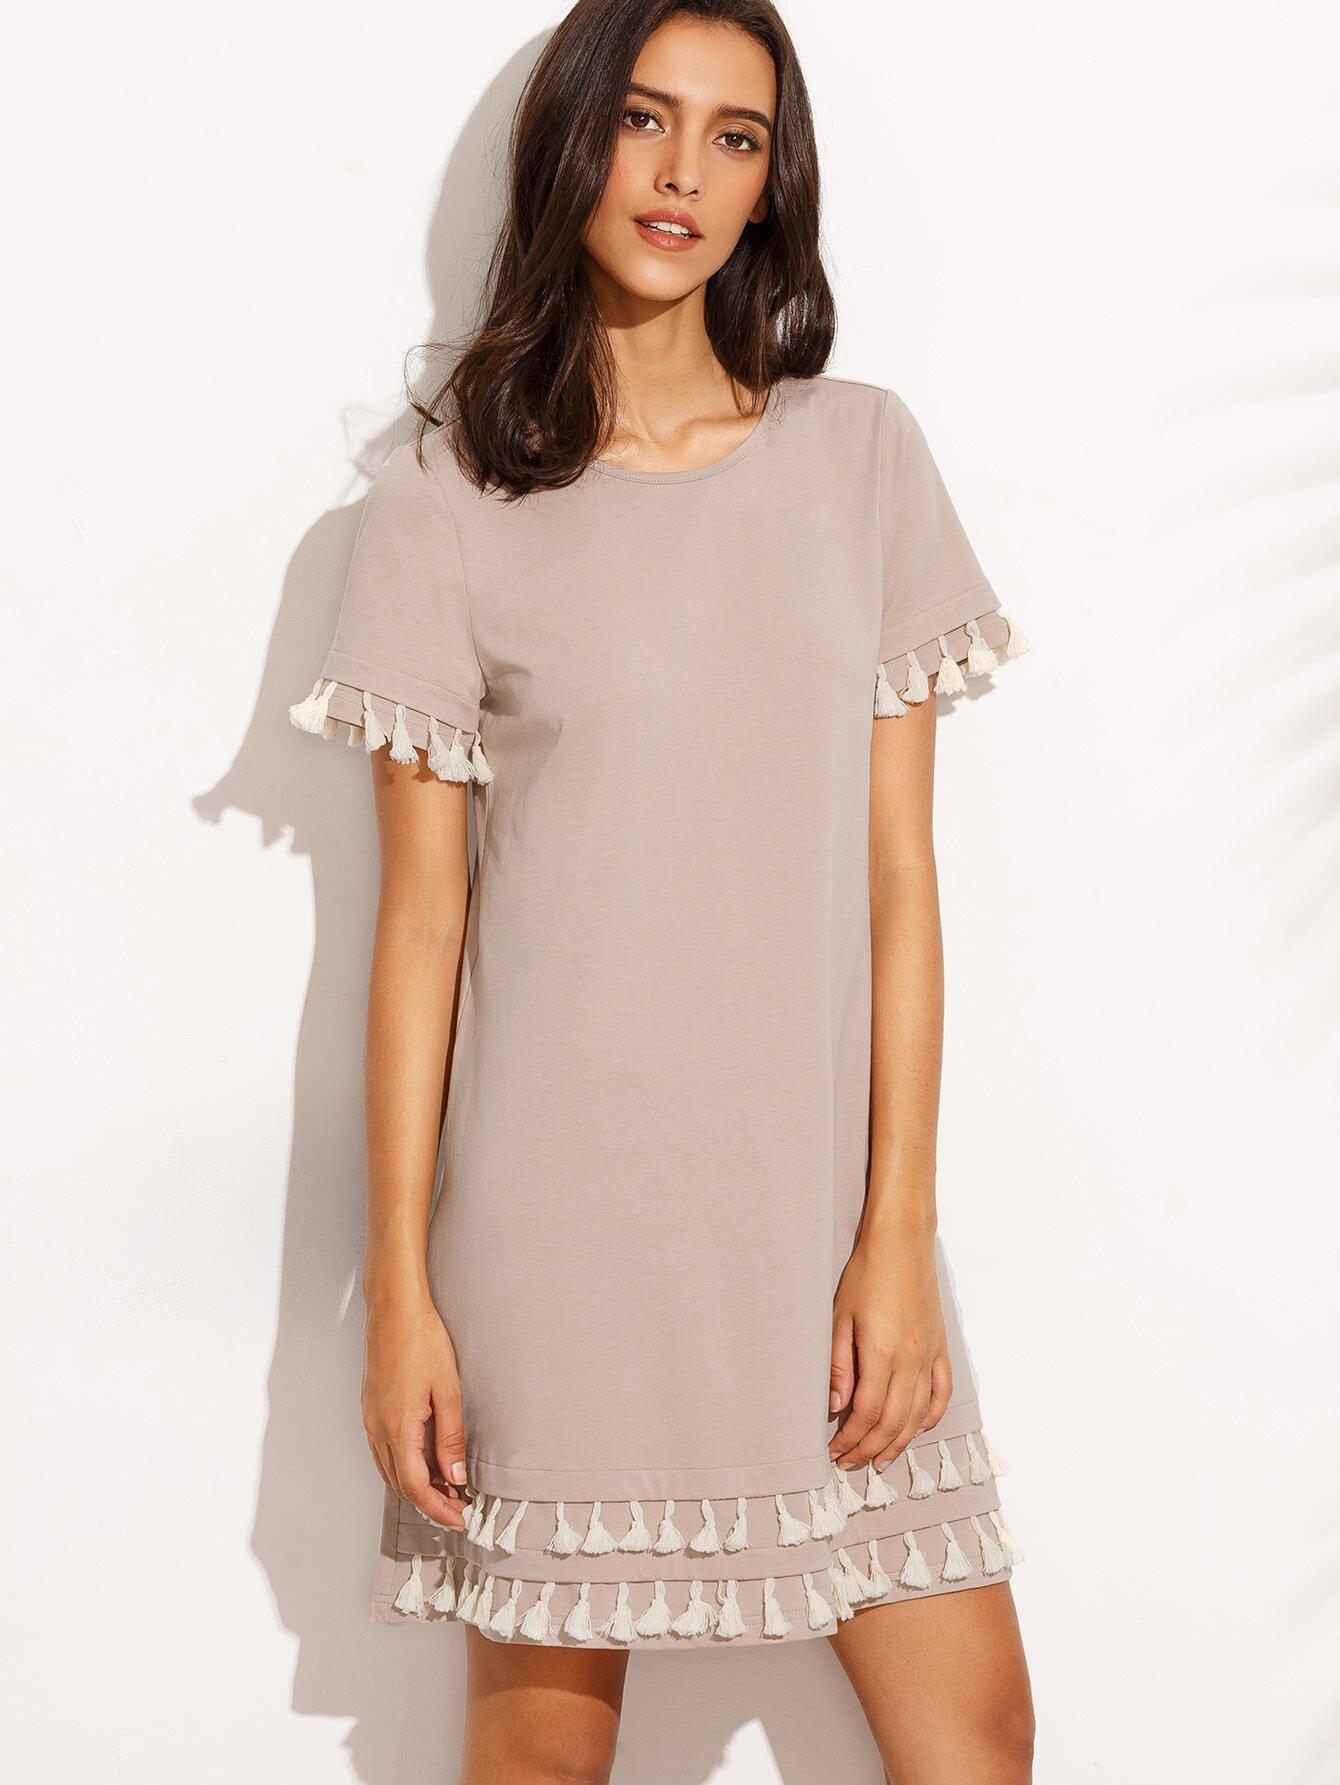 Dark Pink Tassel Hem Short Sleeve Shift Dress dress160729711